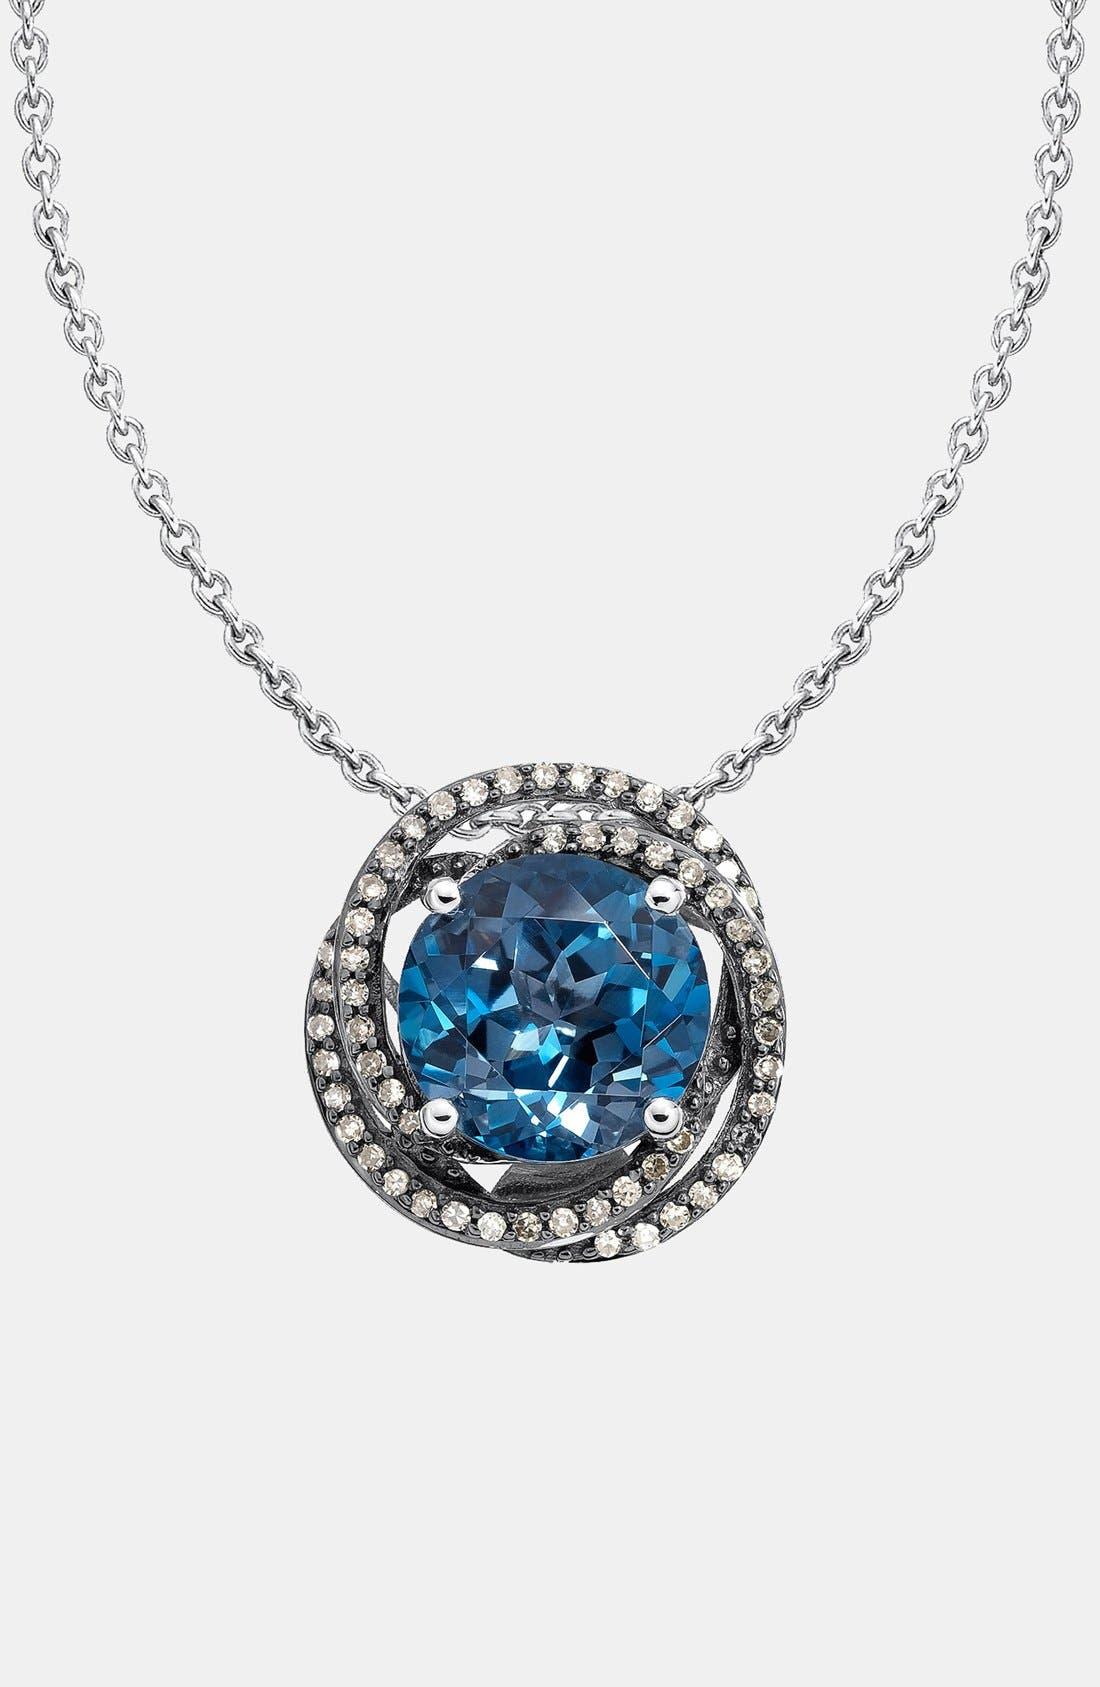 Main Image - Whitney Stern Topaz & Diamond Necklace